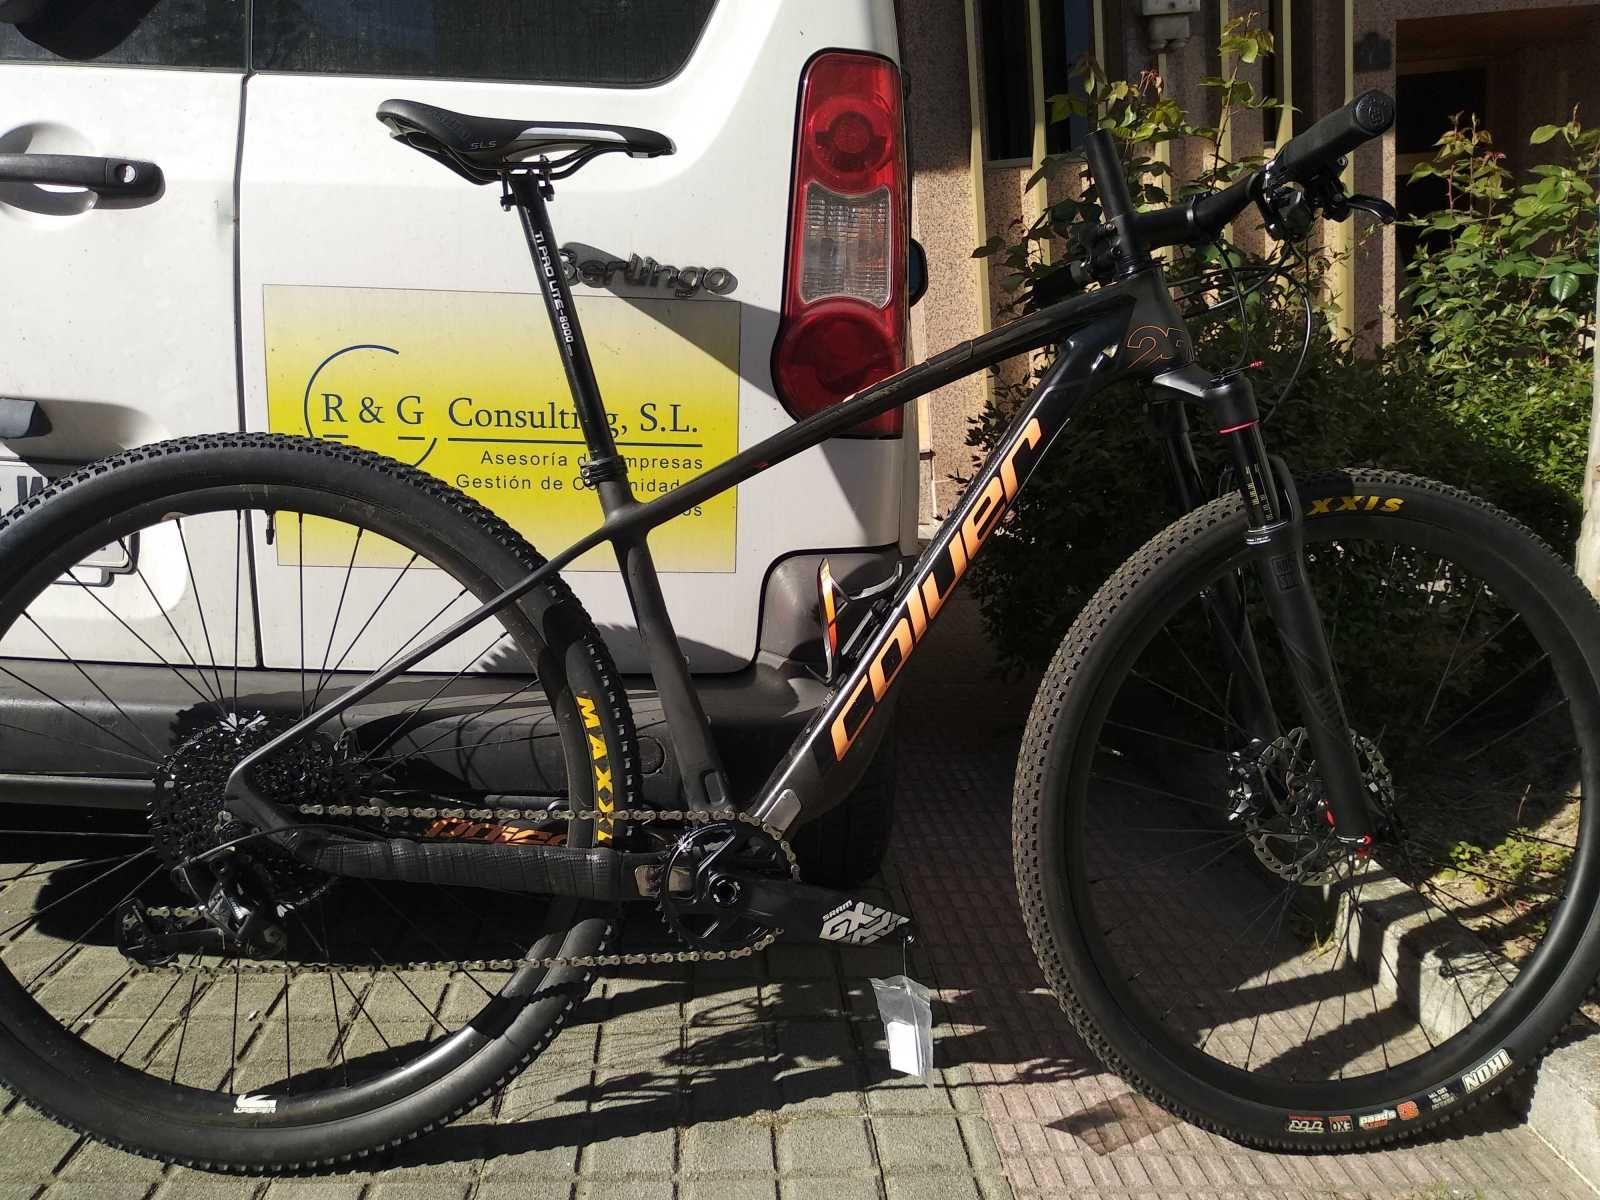 Big Wheel Cool Bicycles Cool Bikes Bicycle